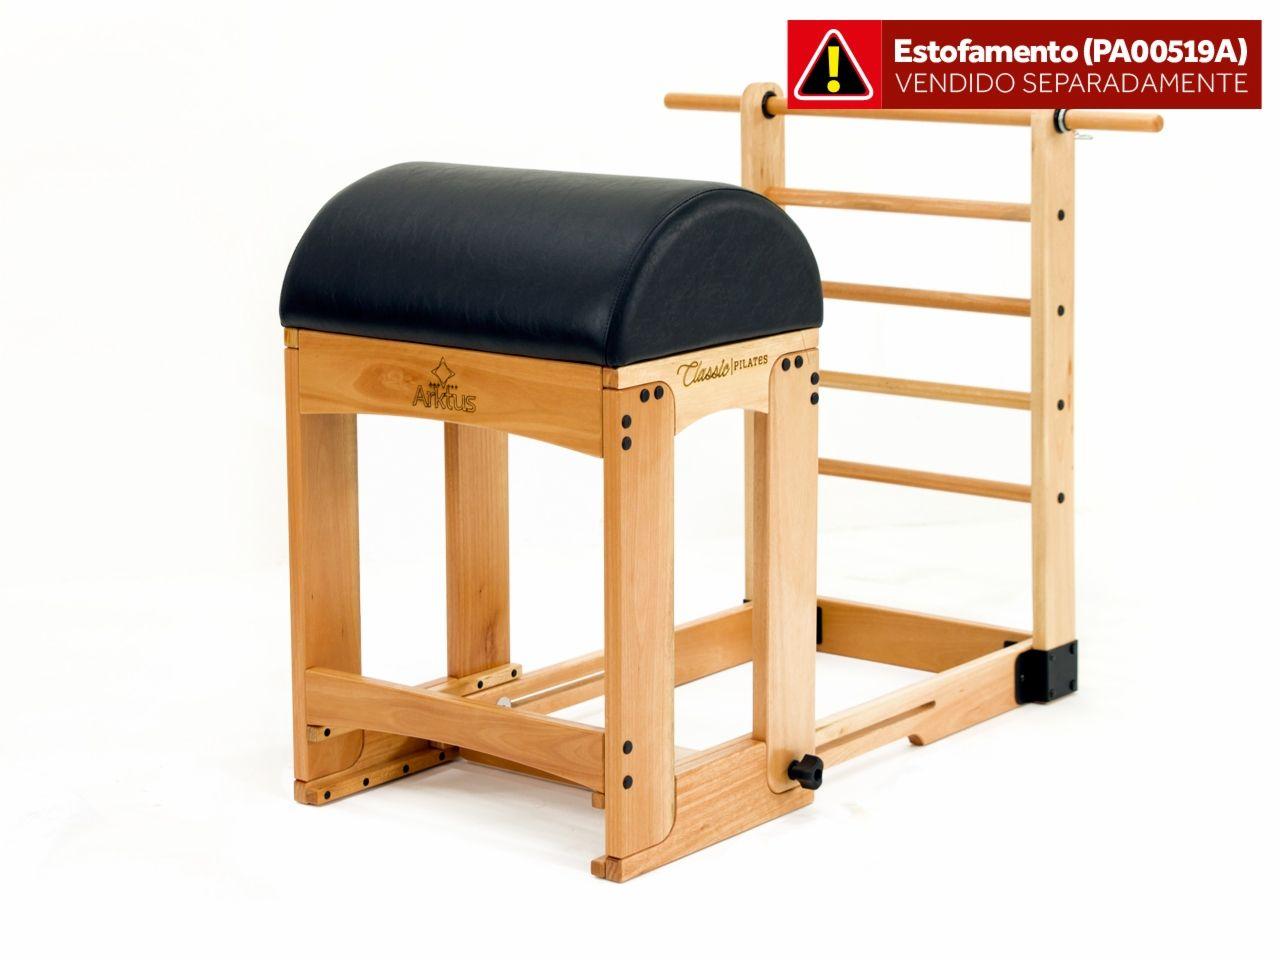 http://www.ispsaude.com.br/isp/produto/Ladder-Barrel-Classic-Estofamento-vendido-separadamente-PA00519A-Arktus/PA00502A?pagLoja=5